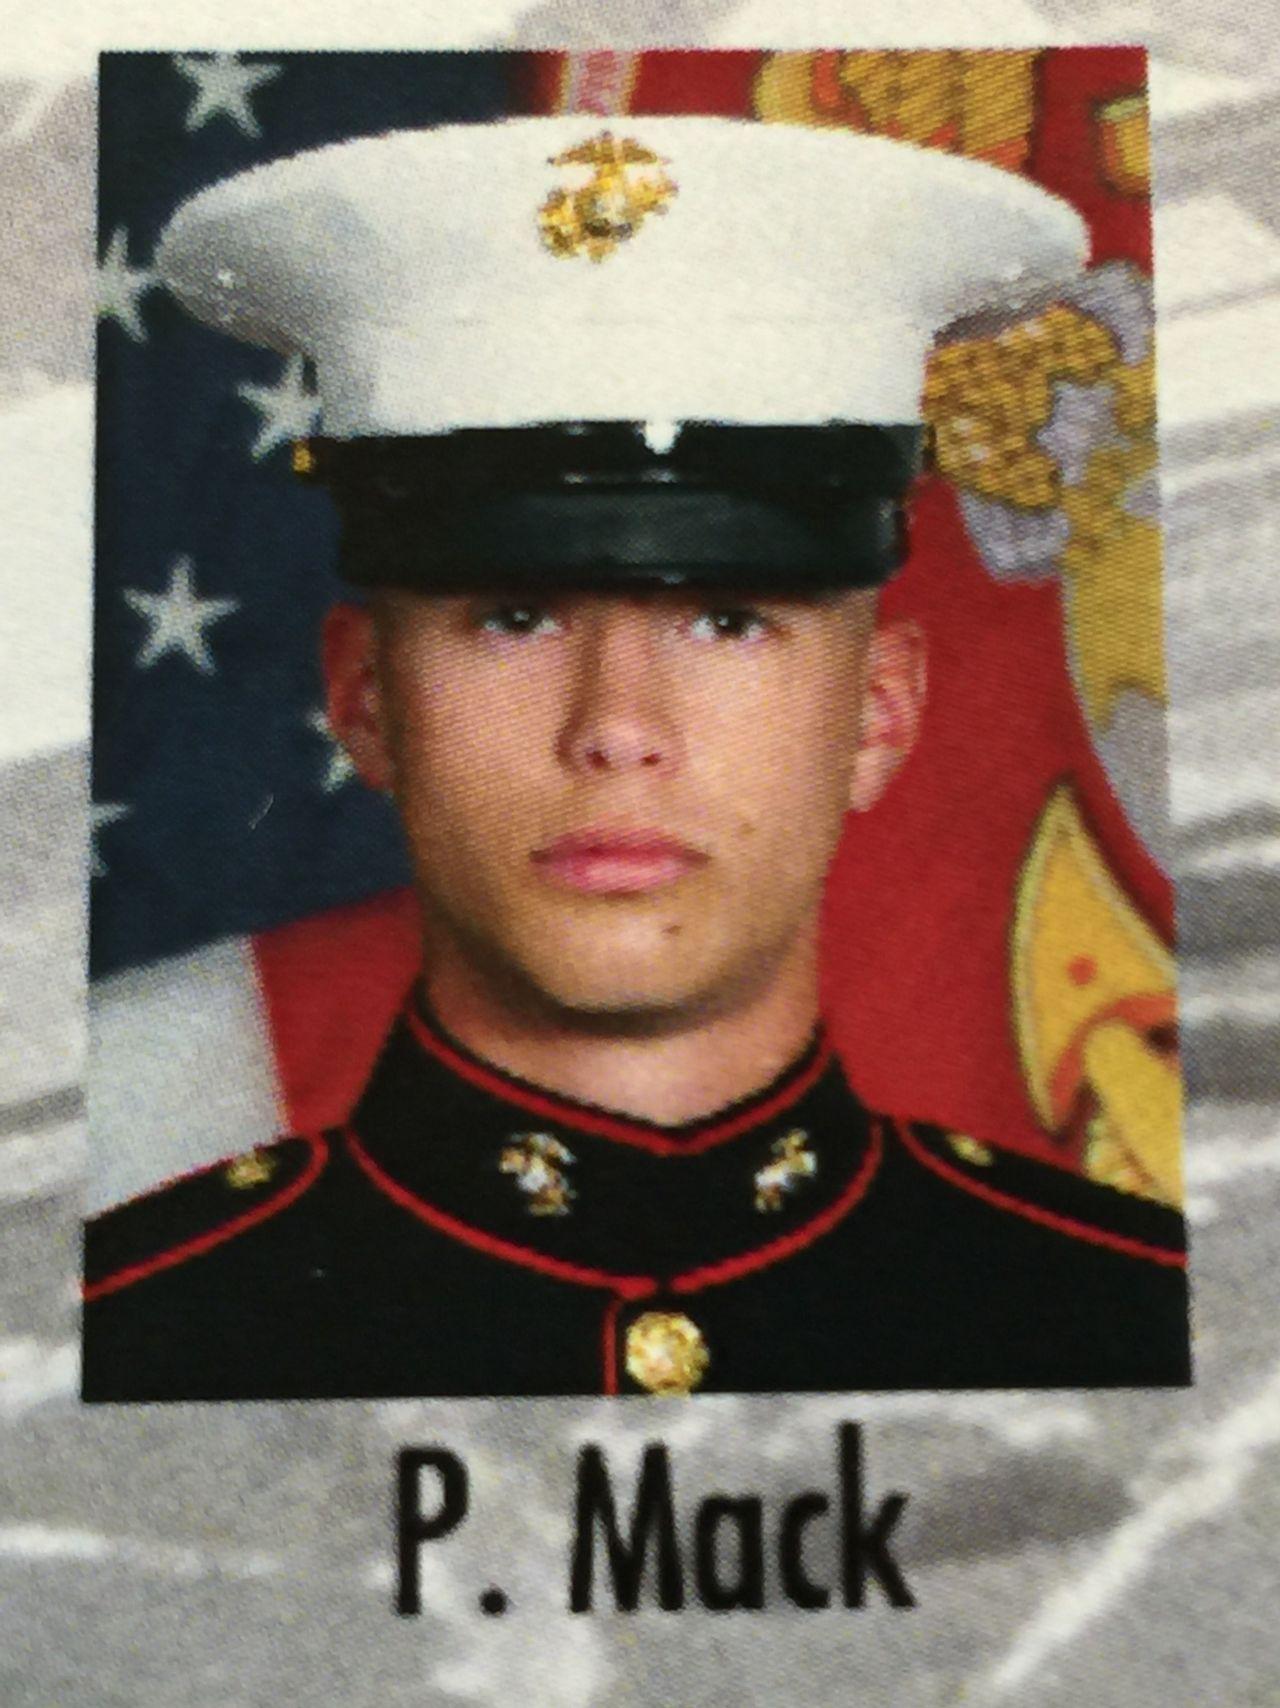 Patryk Mack United States Marine Corps